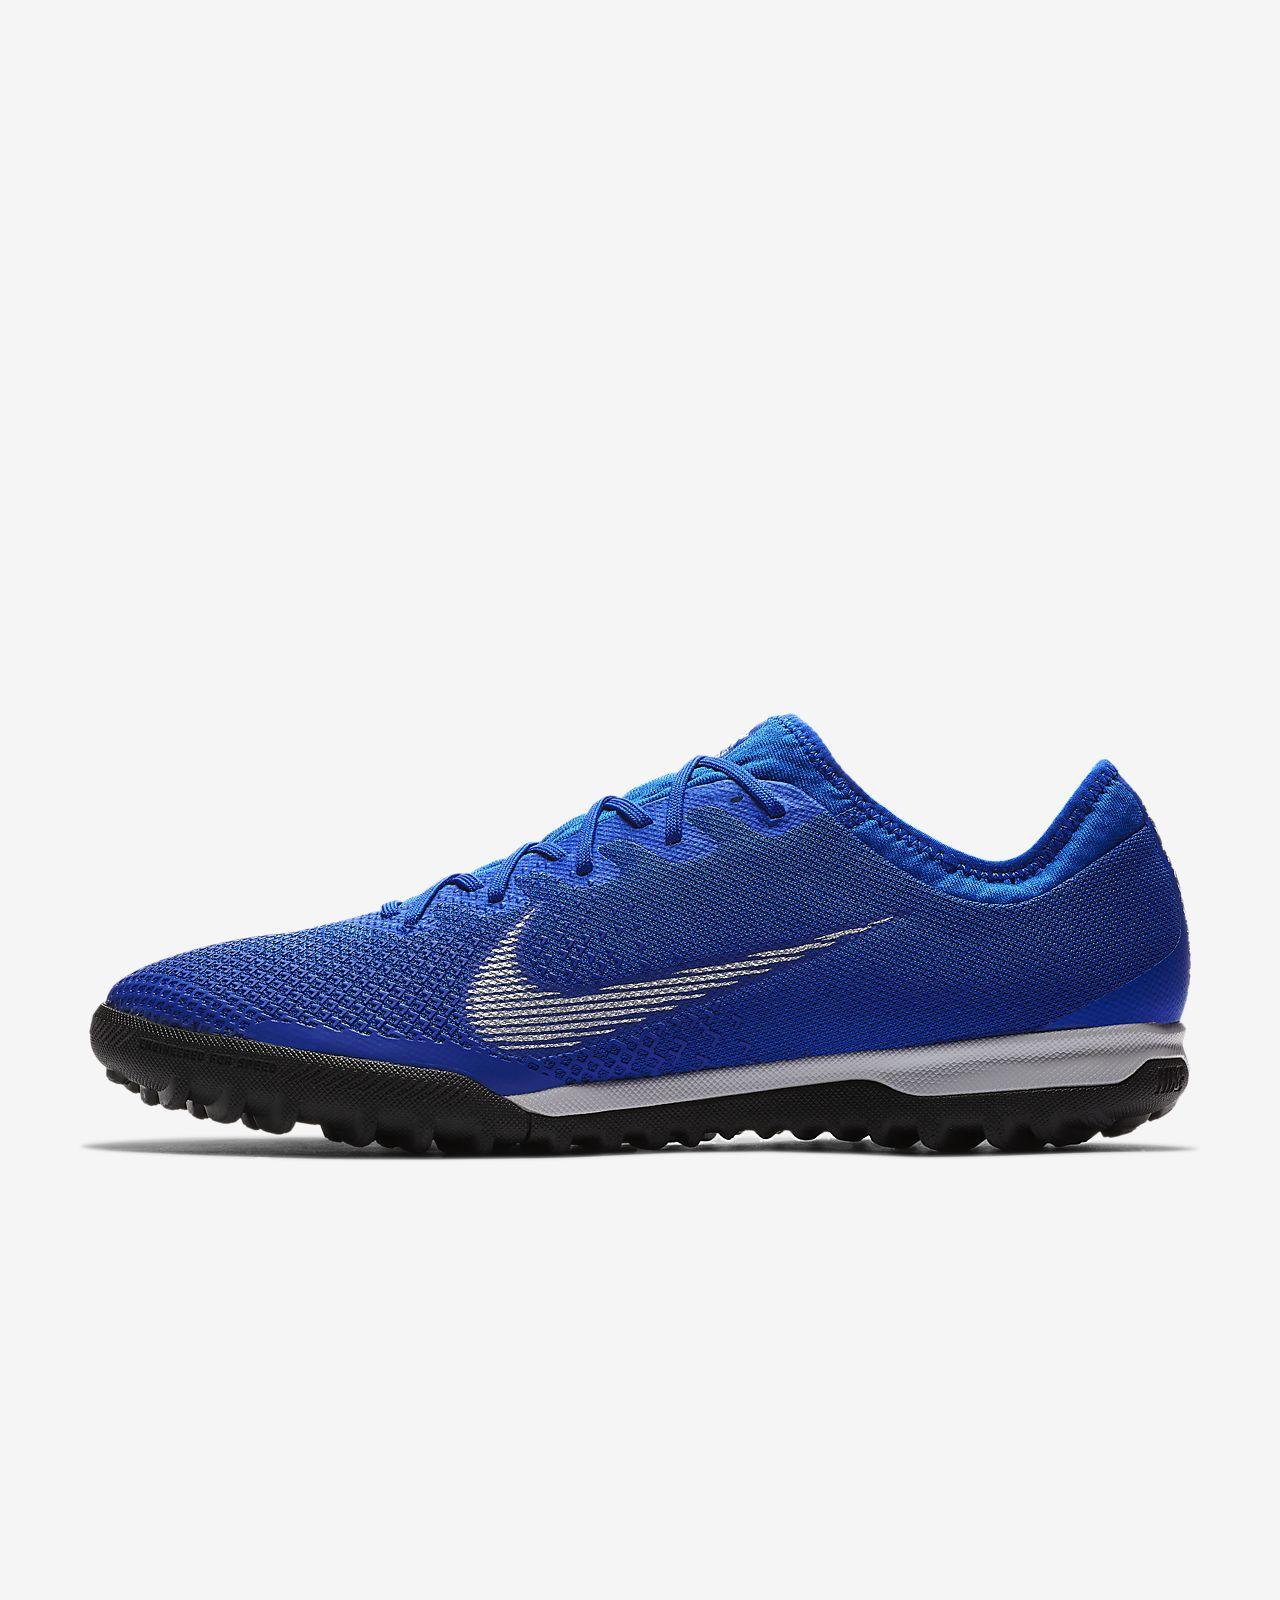 best website 67fdb 3c3f1 Nike MercurialX Vapor XII Pro TF